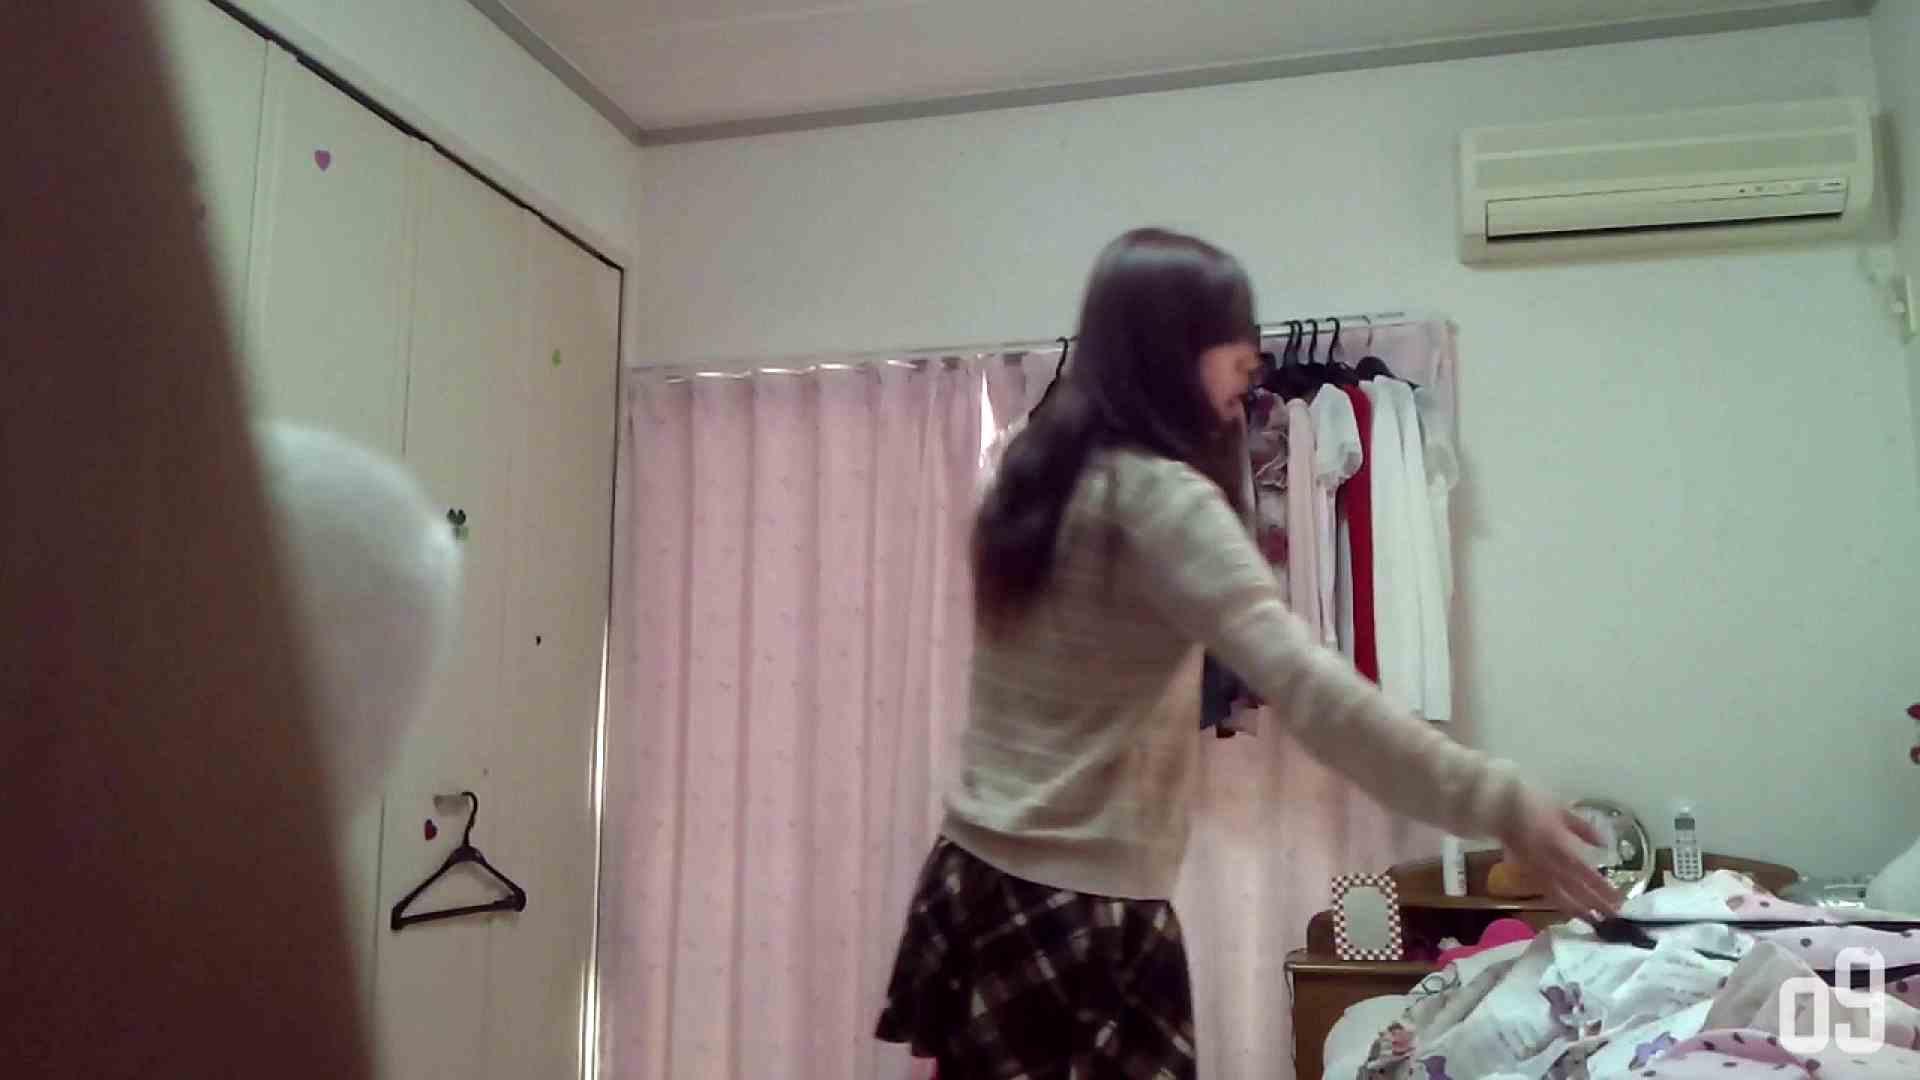 vol.2 瑞希ちゃんの自宅公開!寝起きの着替え・・・ラリルそー OLヌード天国  94PIX 74